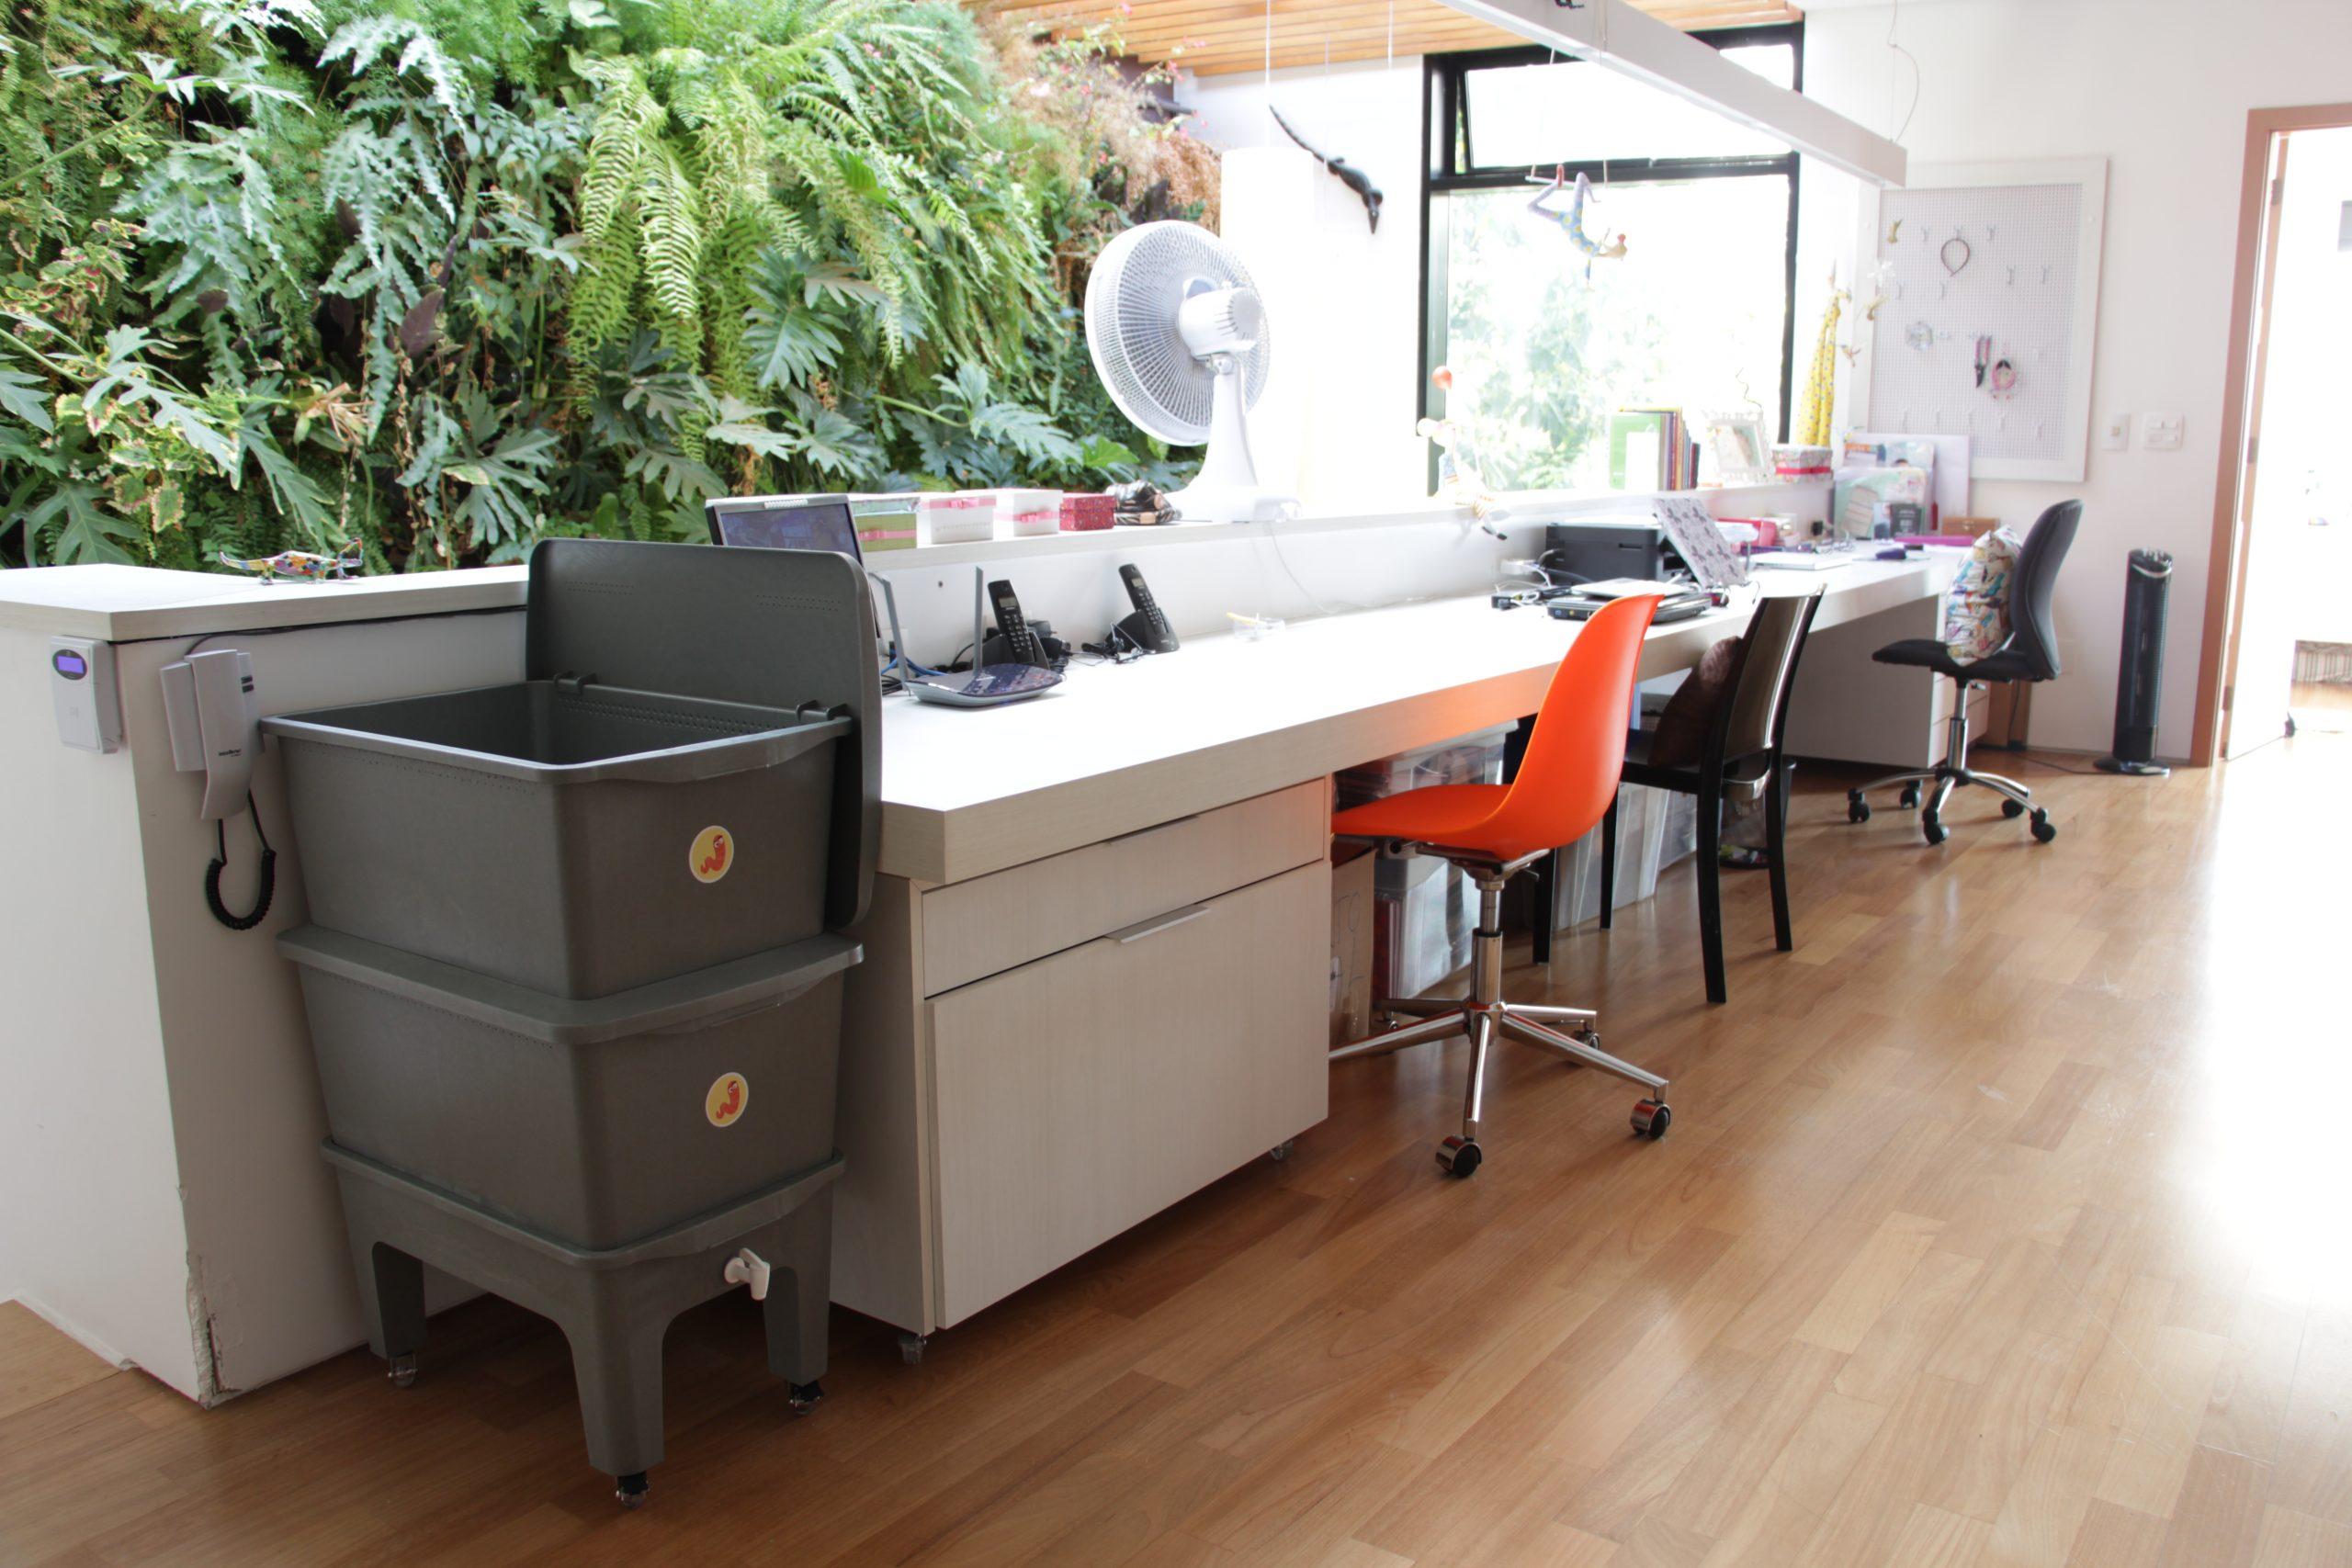 Composteira Humi Cinza no escritório